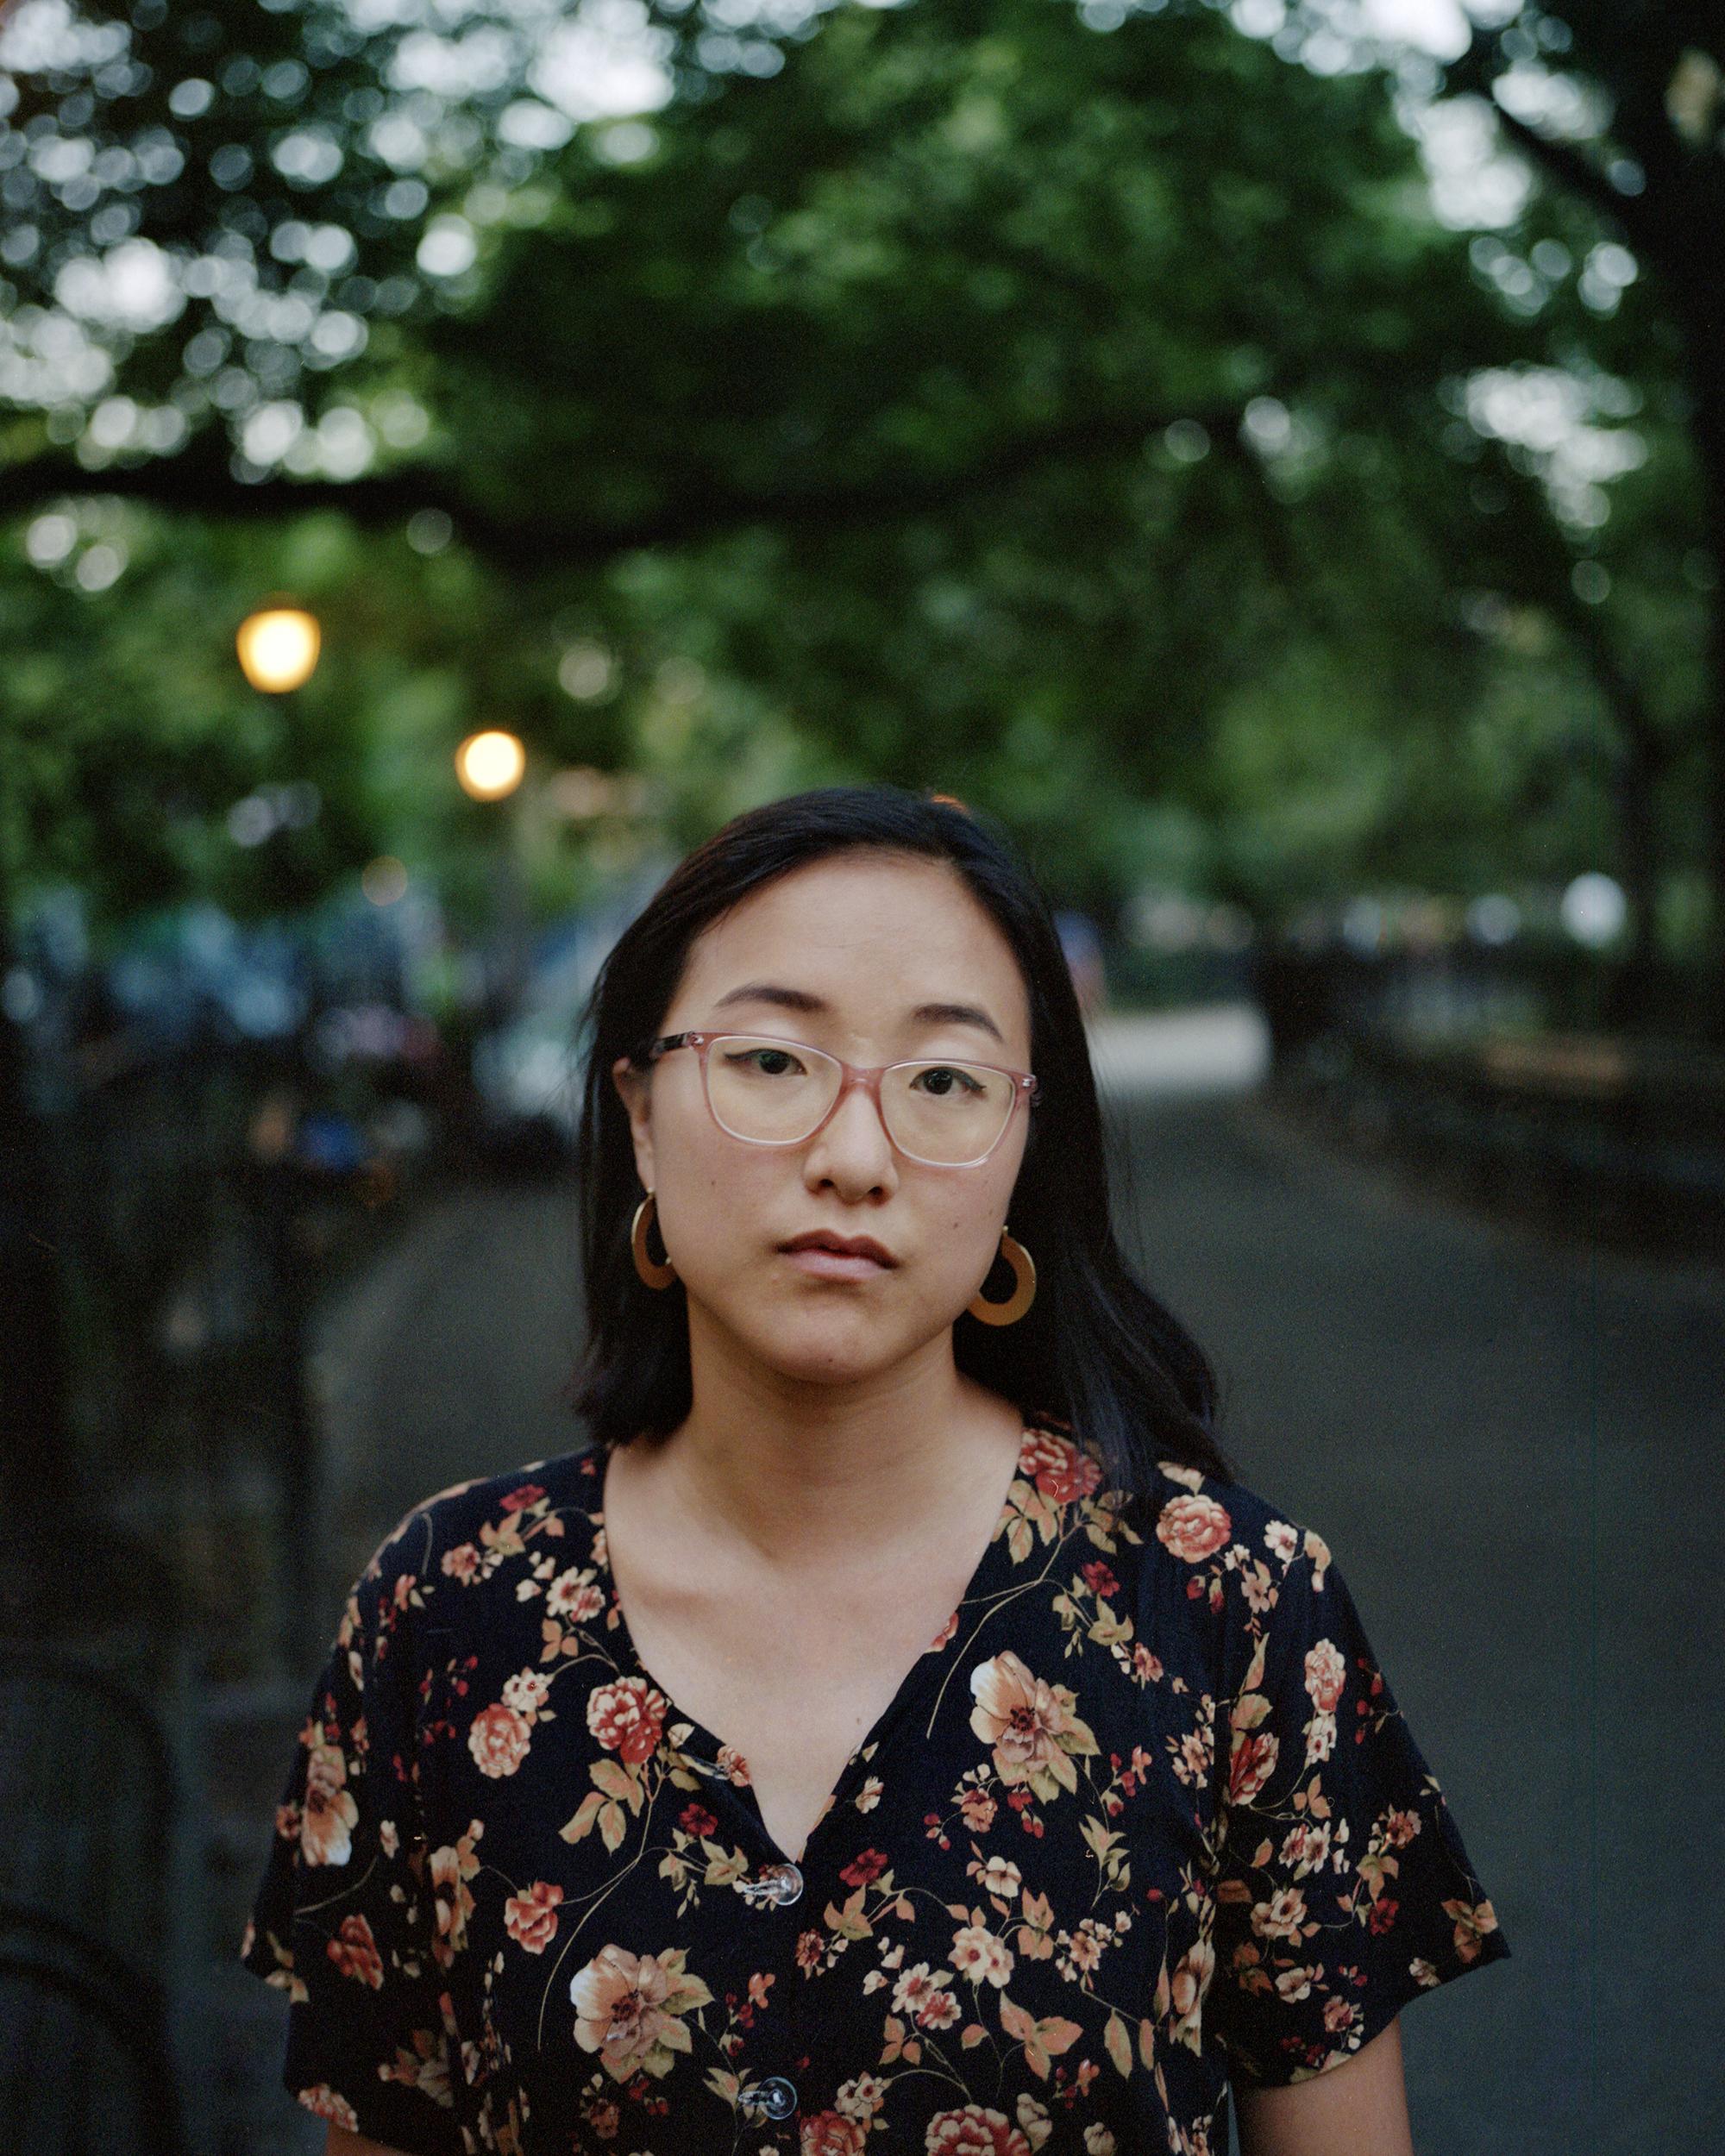 Victoria Lin on her 25th birthday, Brooklyn, NYC. 2018.